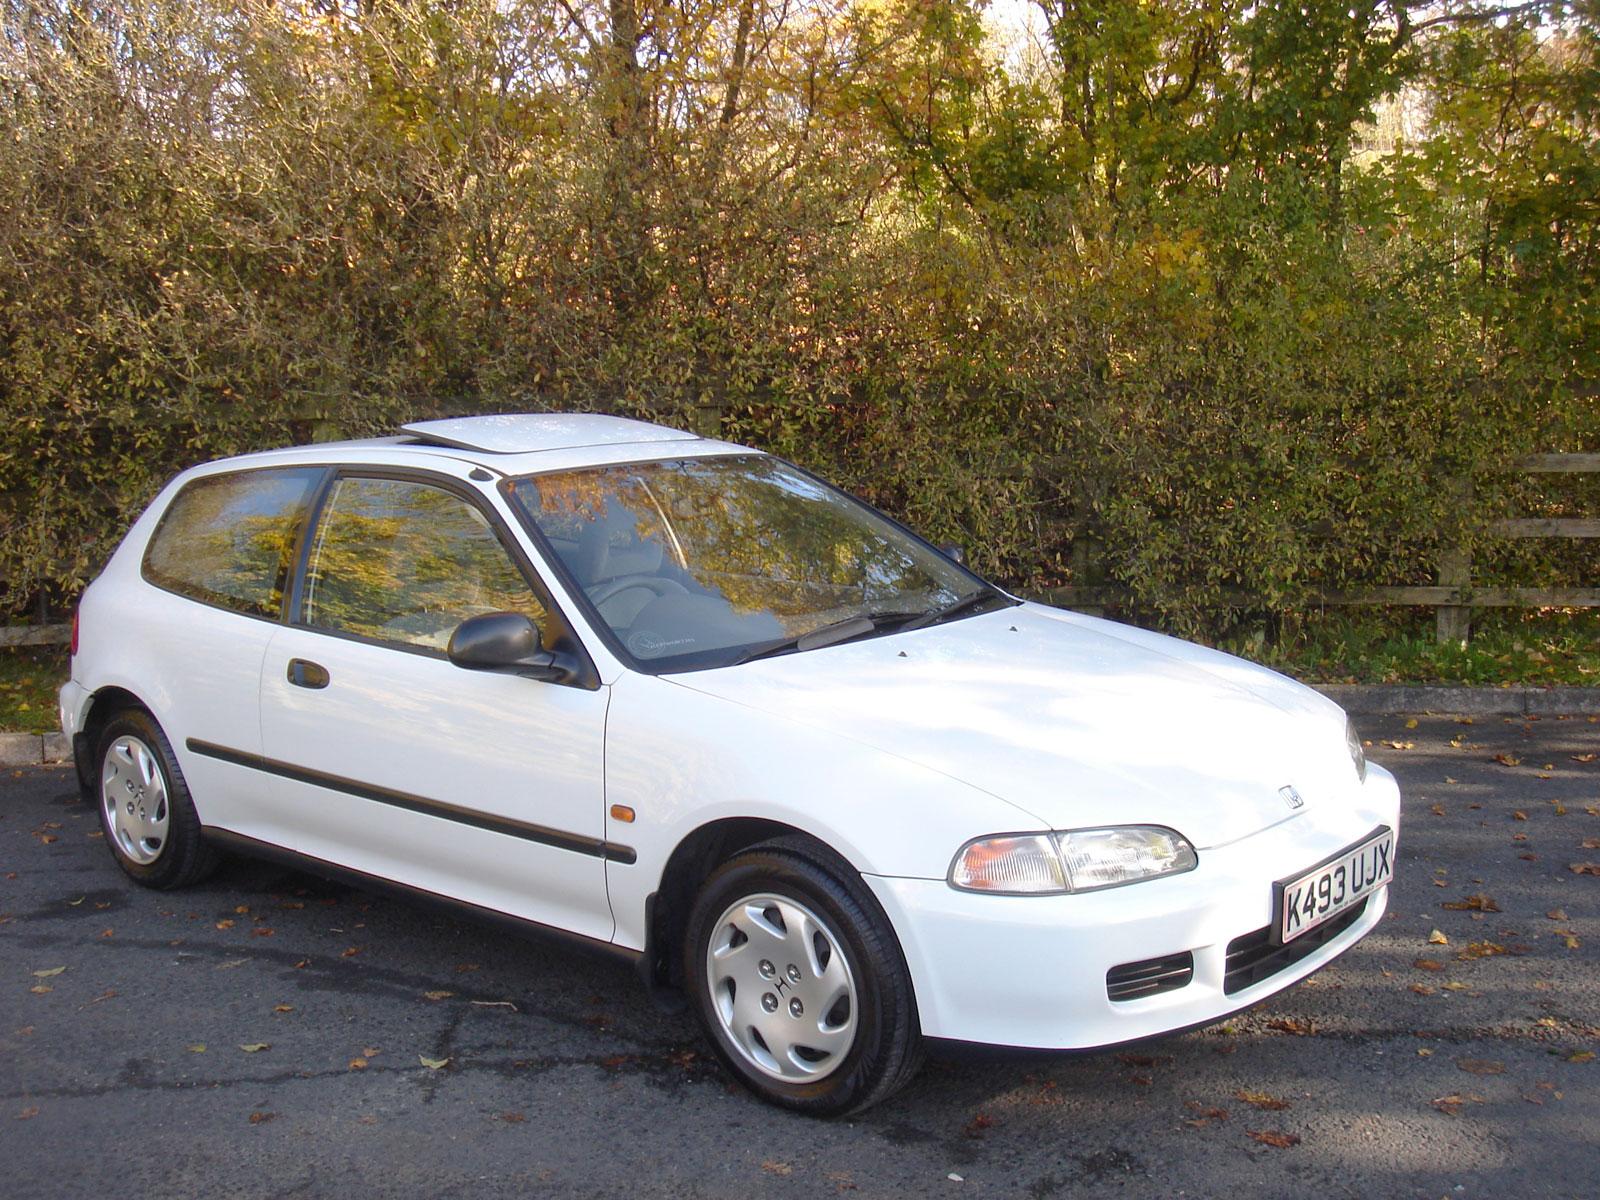 Lot 44 - 1993 Honda Civic ESi